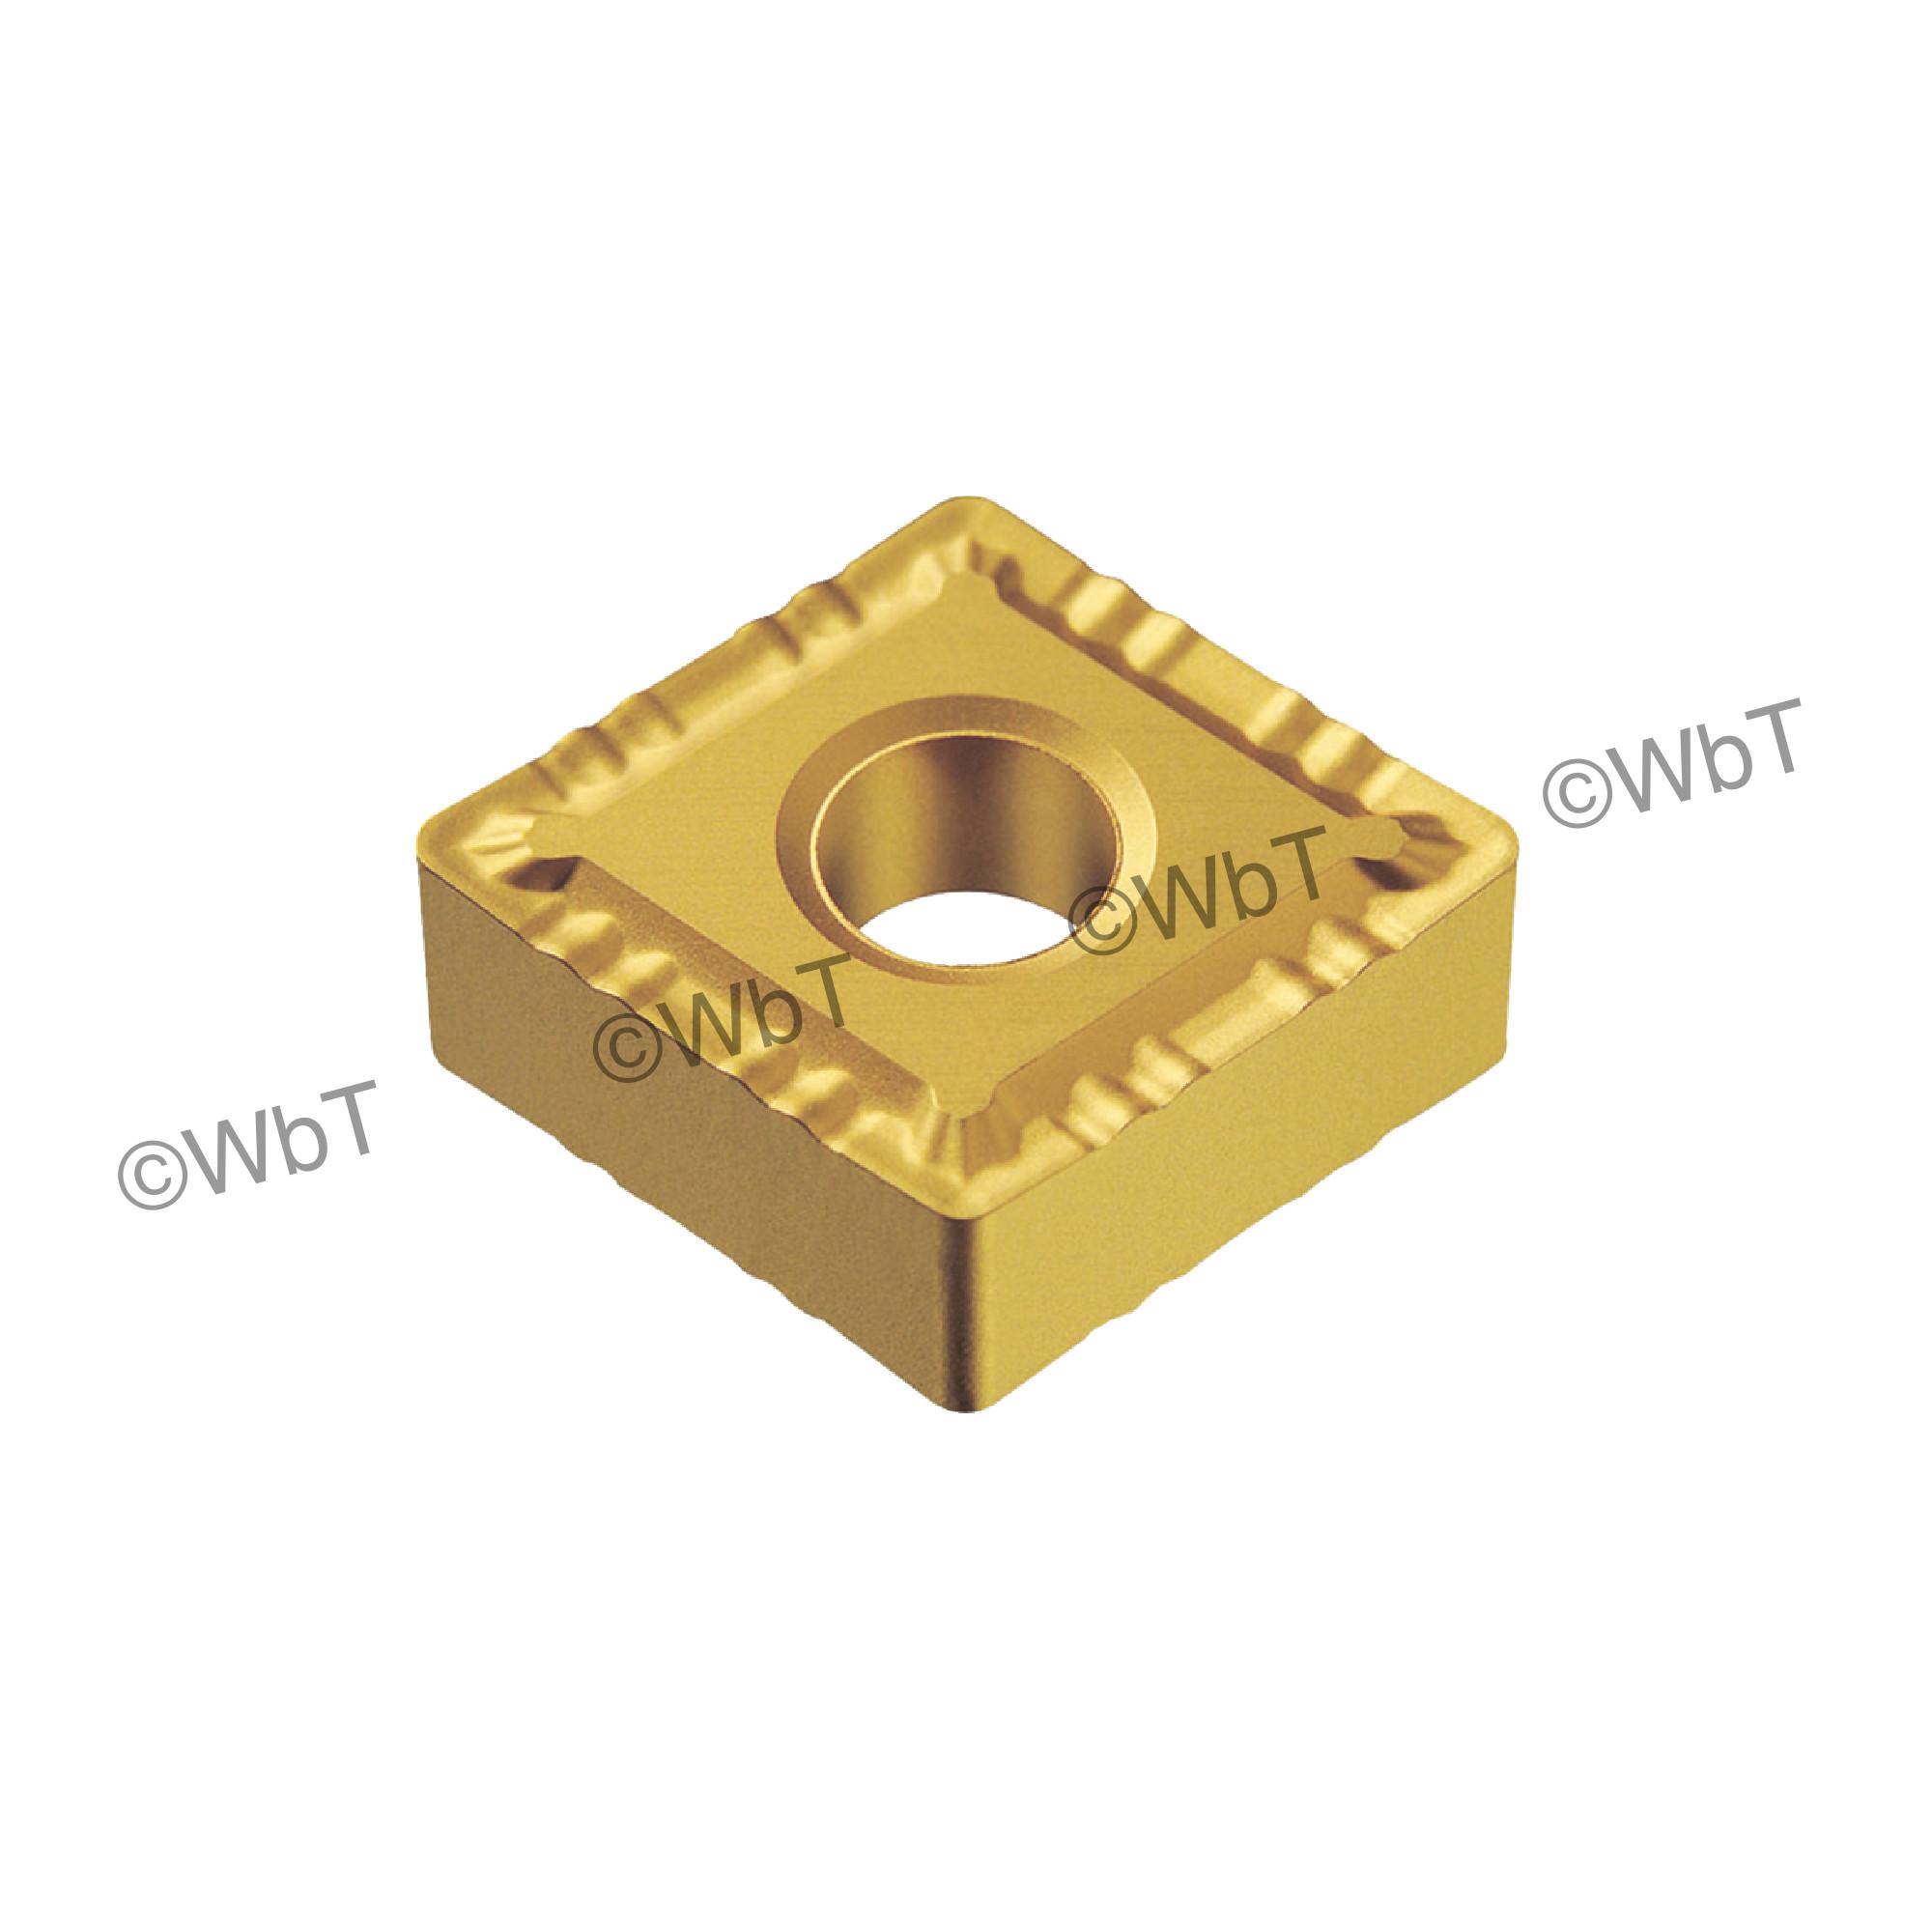 AKUMA - CNMG431-LMP1 CT25M - 80° Diamond / Indexable Carbide Turning Insert